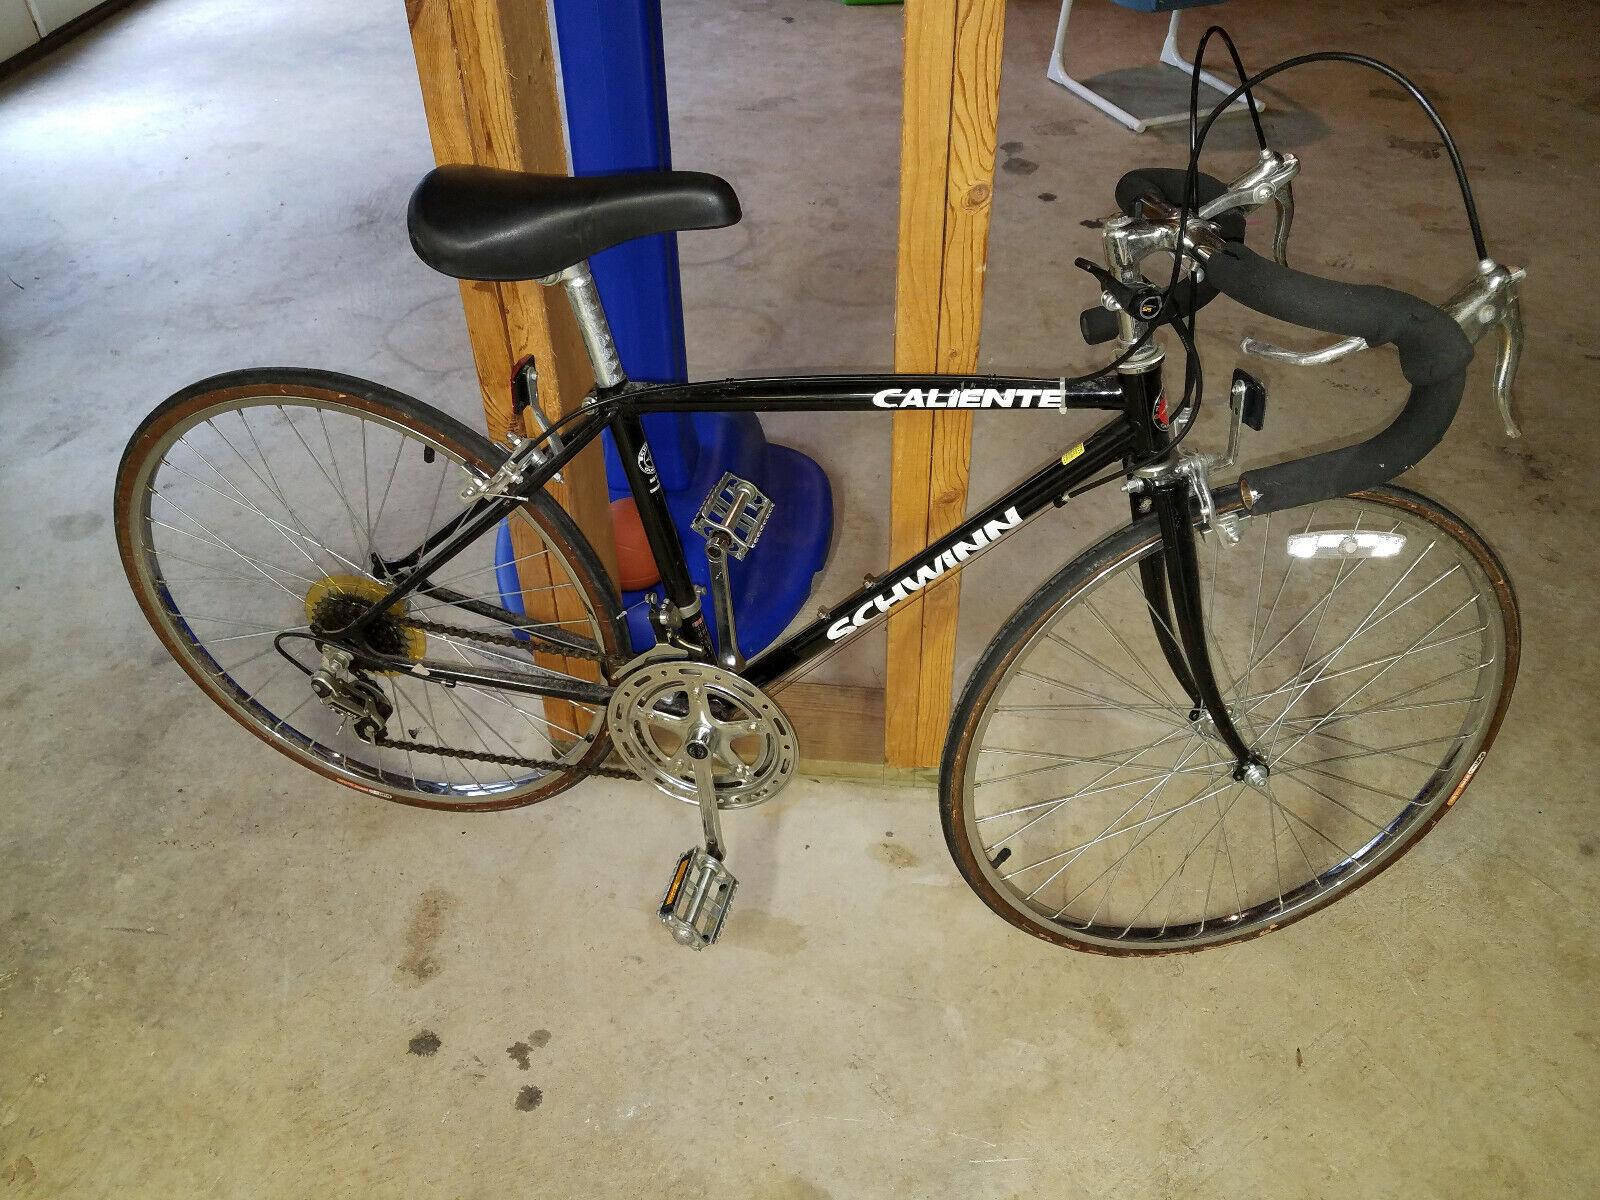 27633a641d4 Find Schwinn Road Bikes for sale